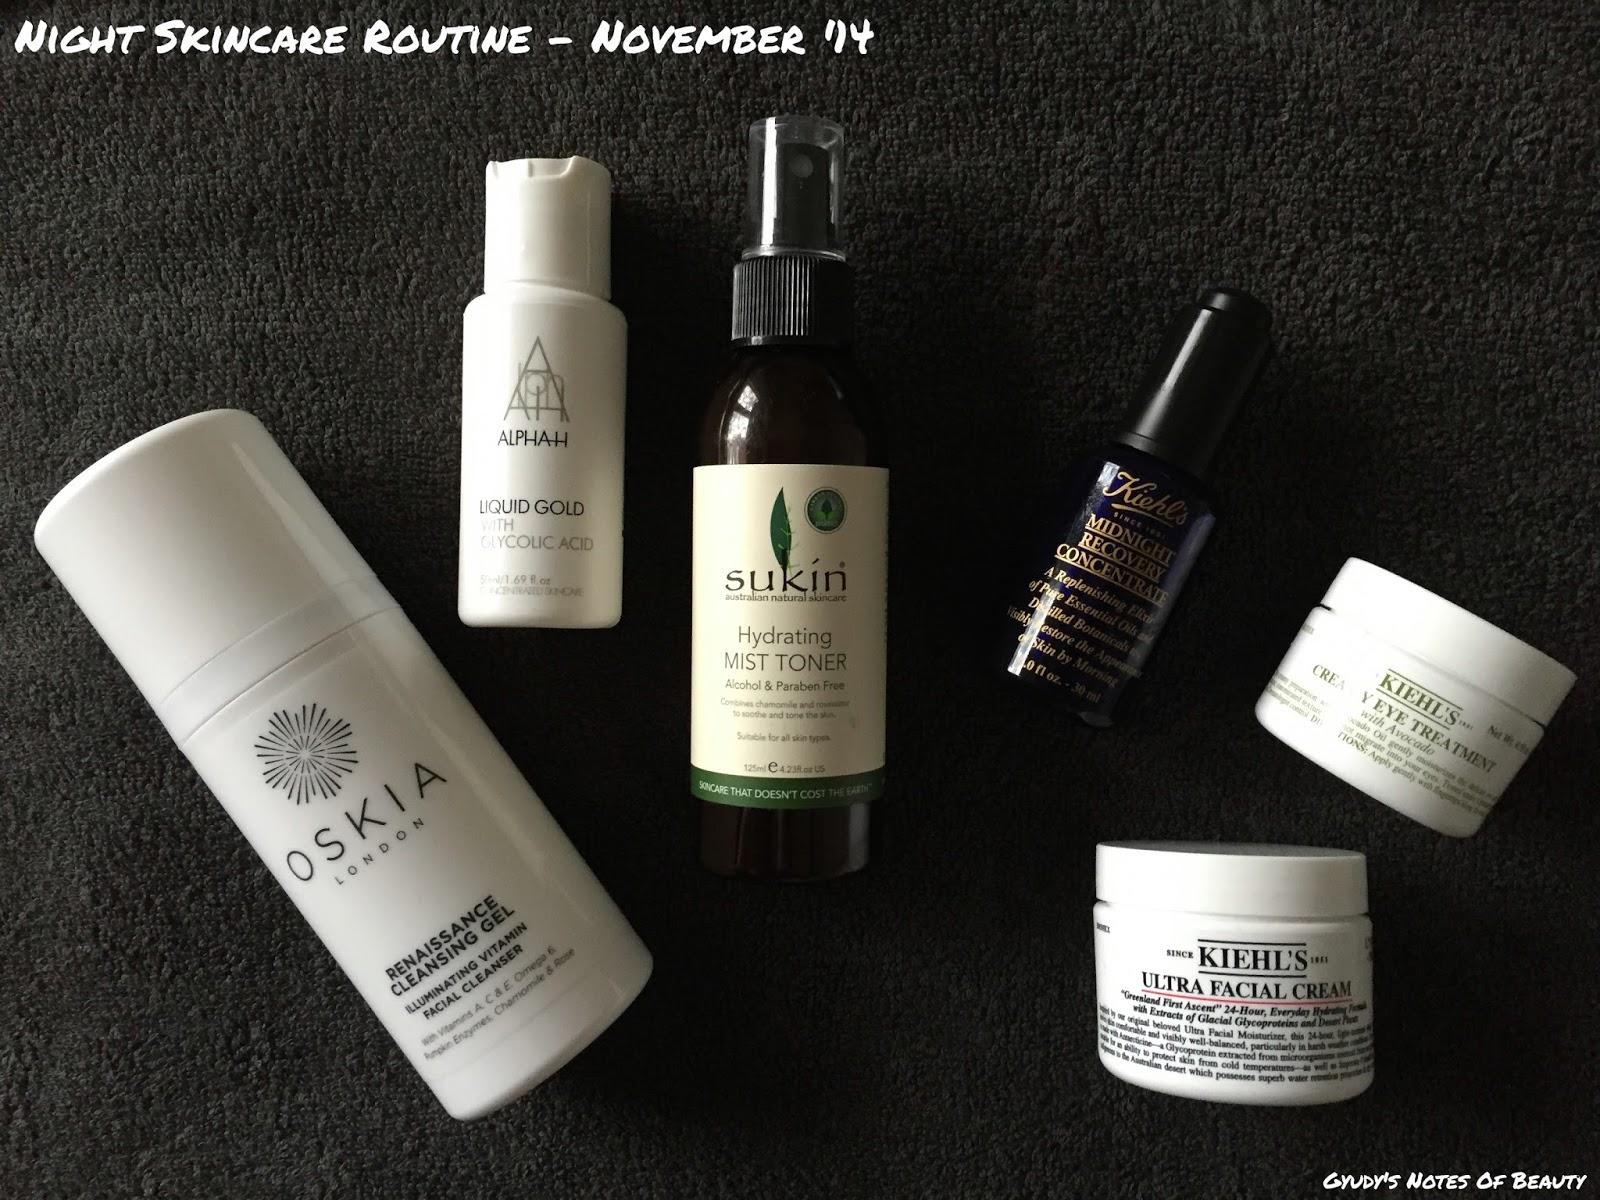 Oskia Alpha H Sukin Kiehl's Night Skincare Routine